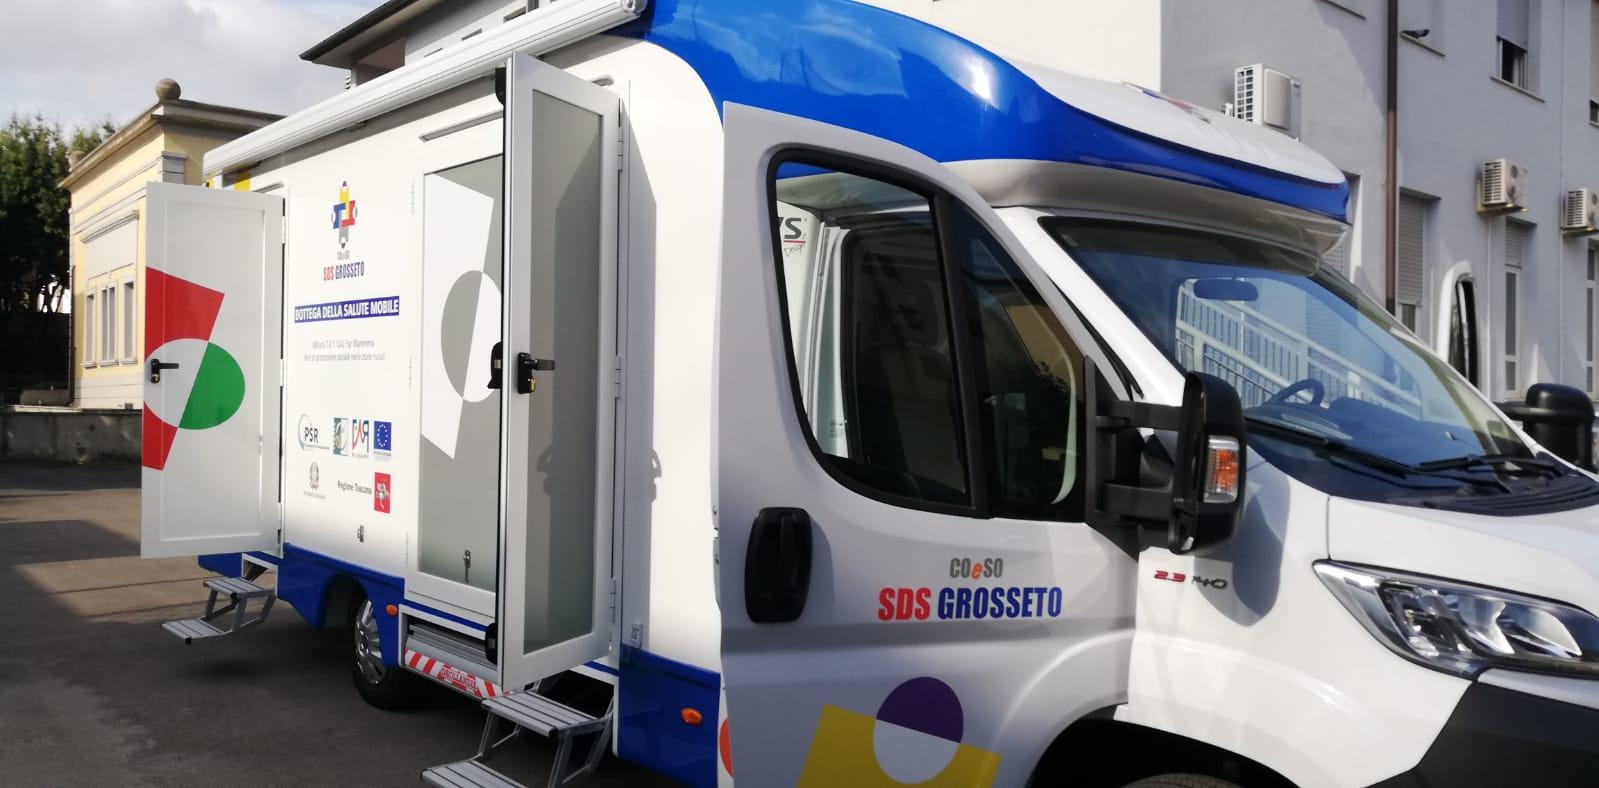 coeso-sds-camper-per-campagna-vaccinazione-Bottega-Salute-Mobile